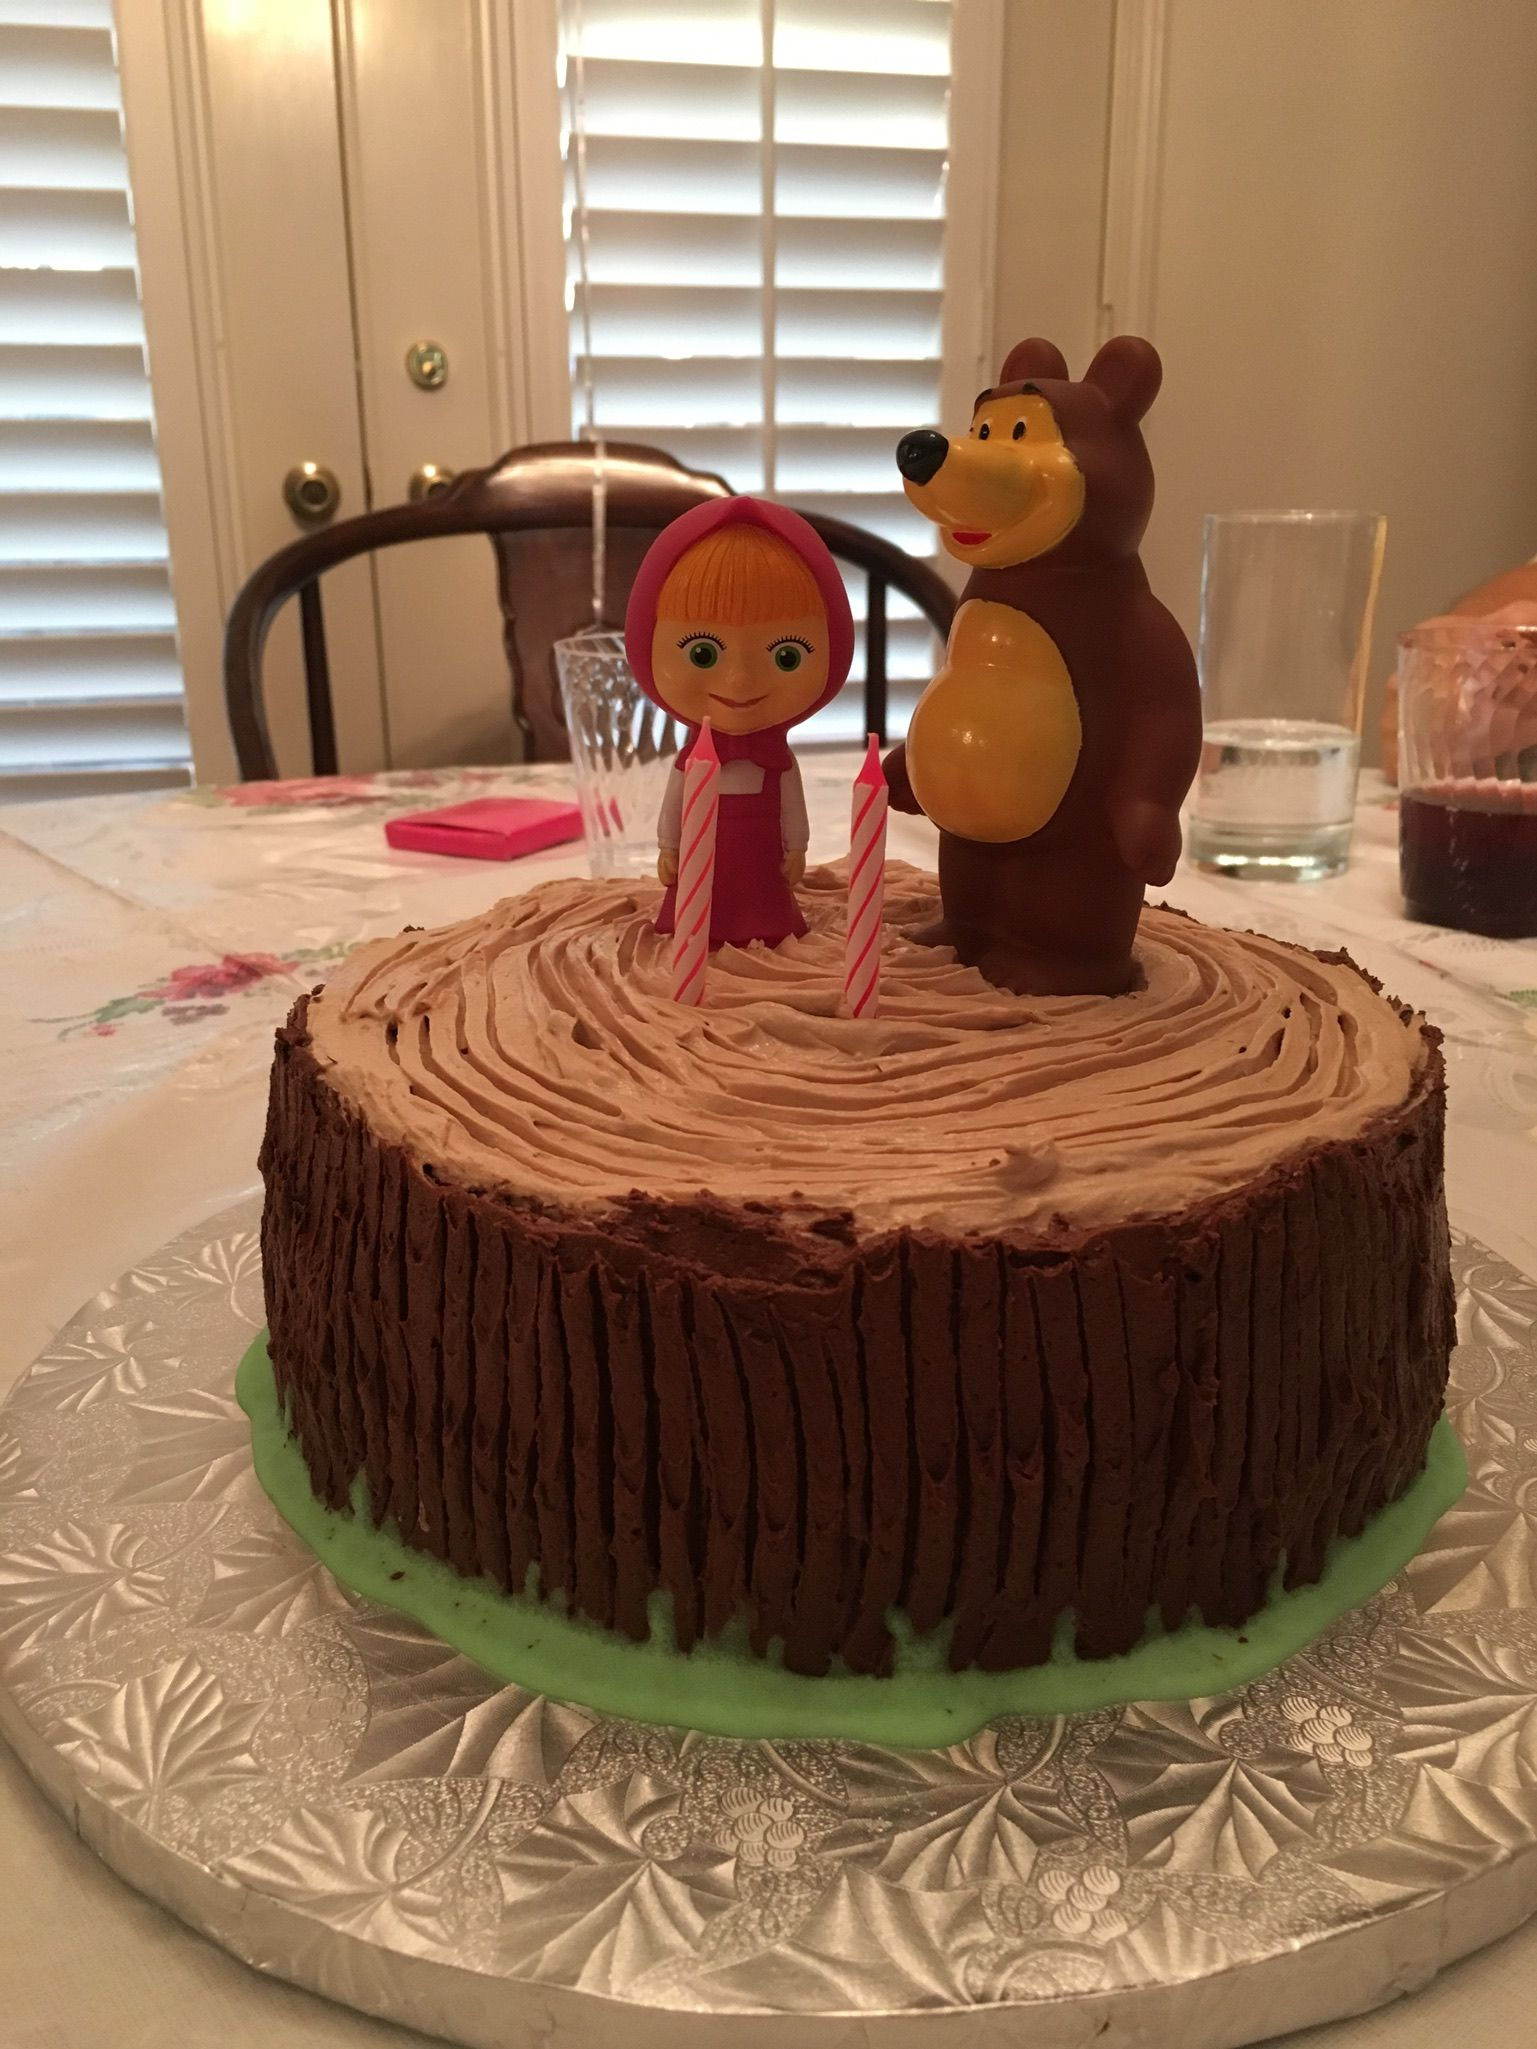 Simple Masha and the Bear Cake Ideas - chocolate buttercream log ...